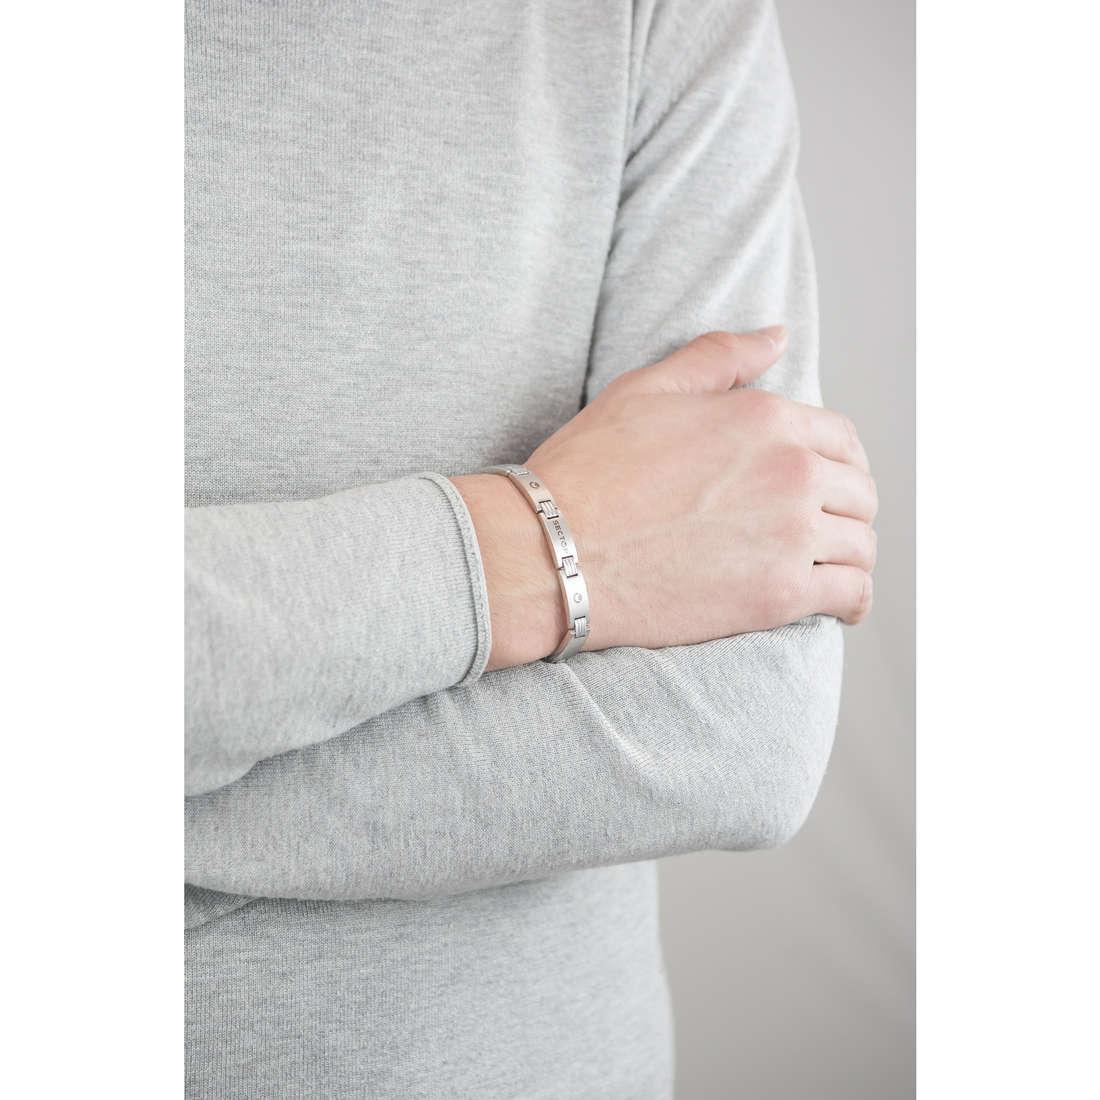 Sector bracciali Basic uomo SLI62 indosso